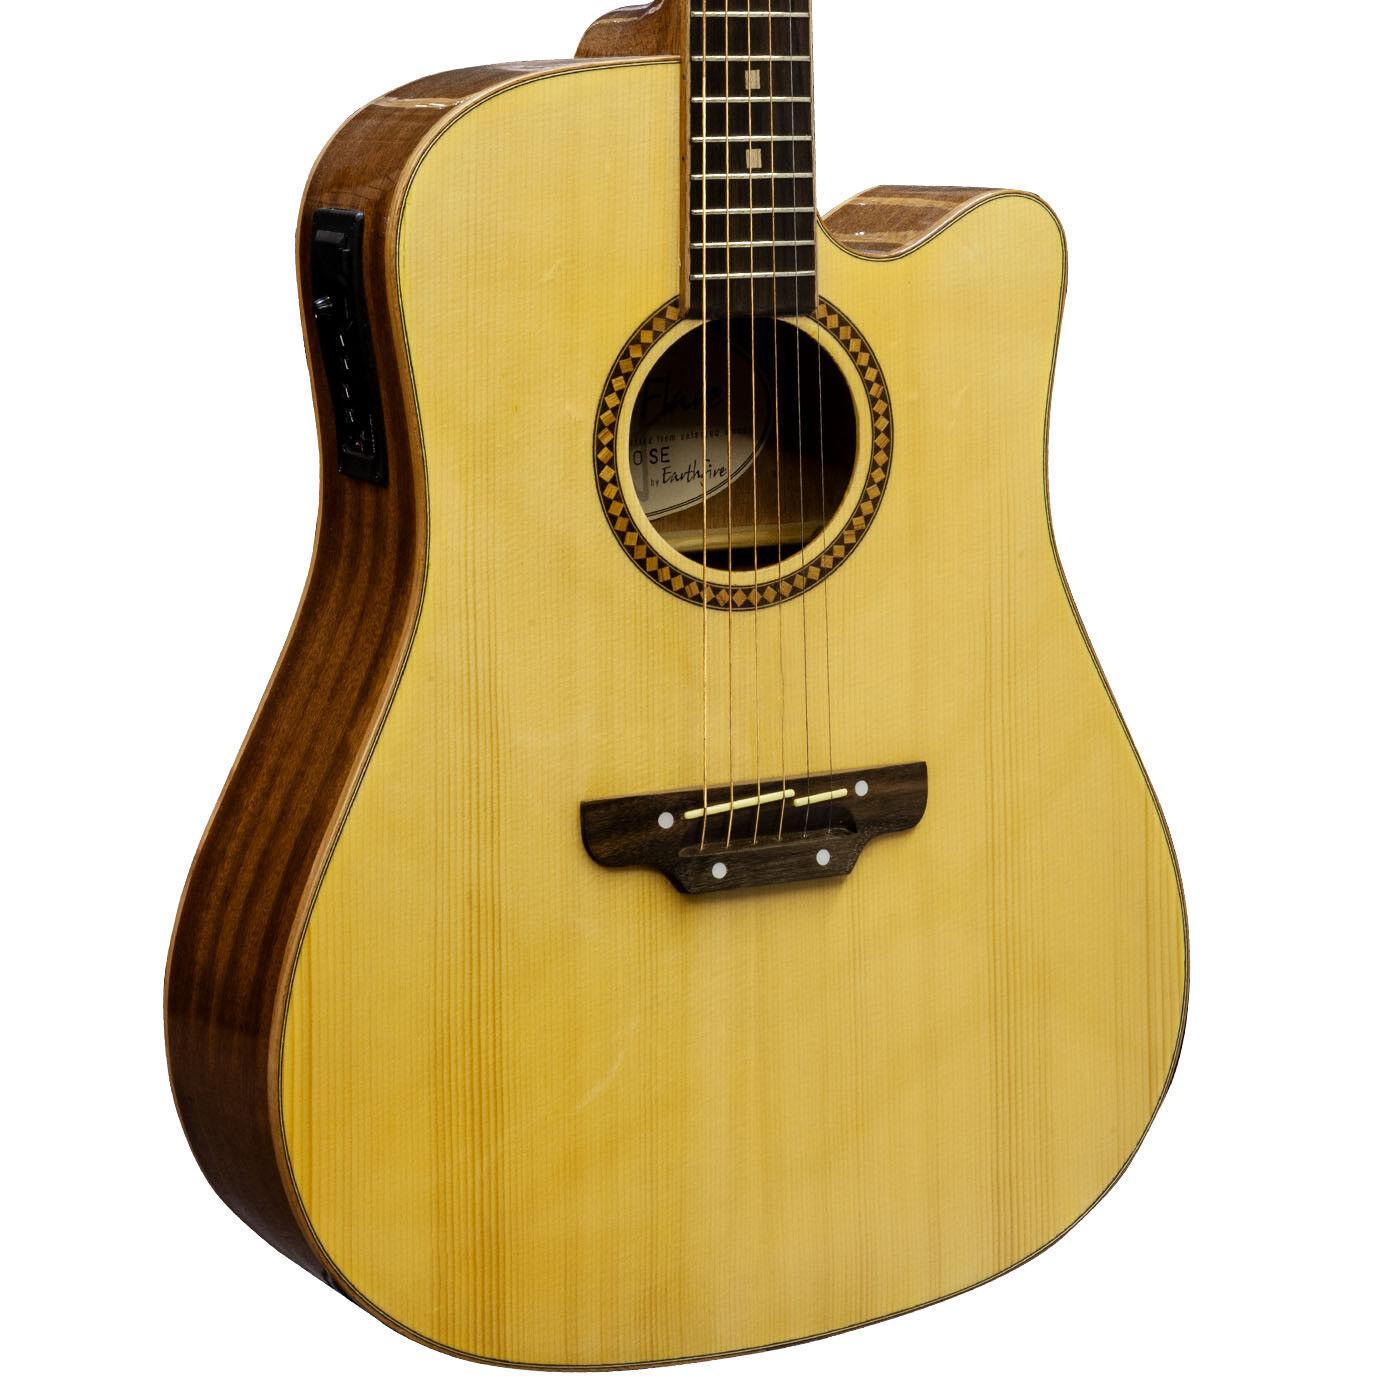 Earthfire GA6090SE Guitarra Acústica Jumbo Electro Electro Jumbo Cadena De Acero Top Solid Cutway C d840e8